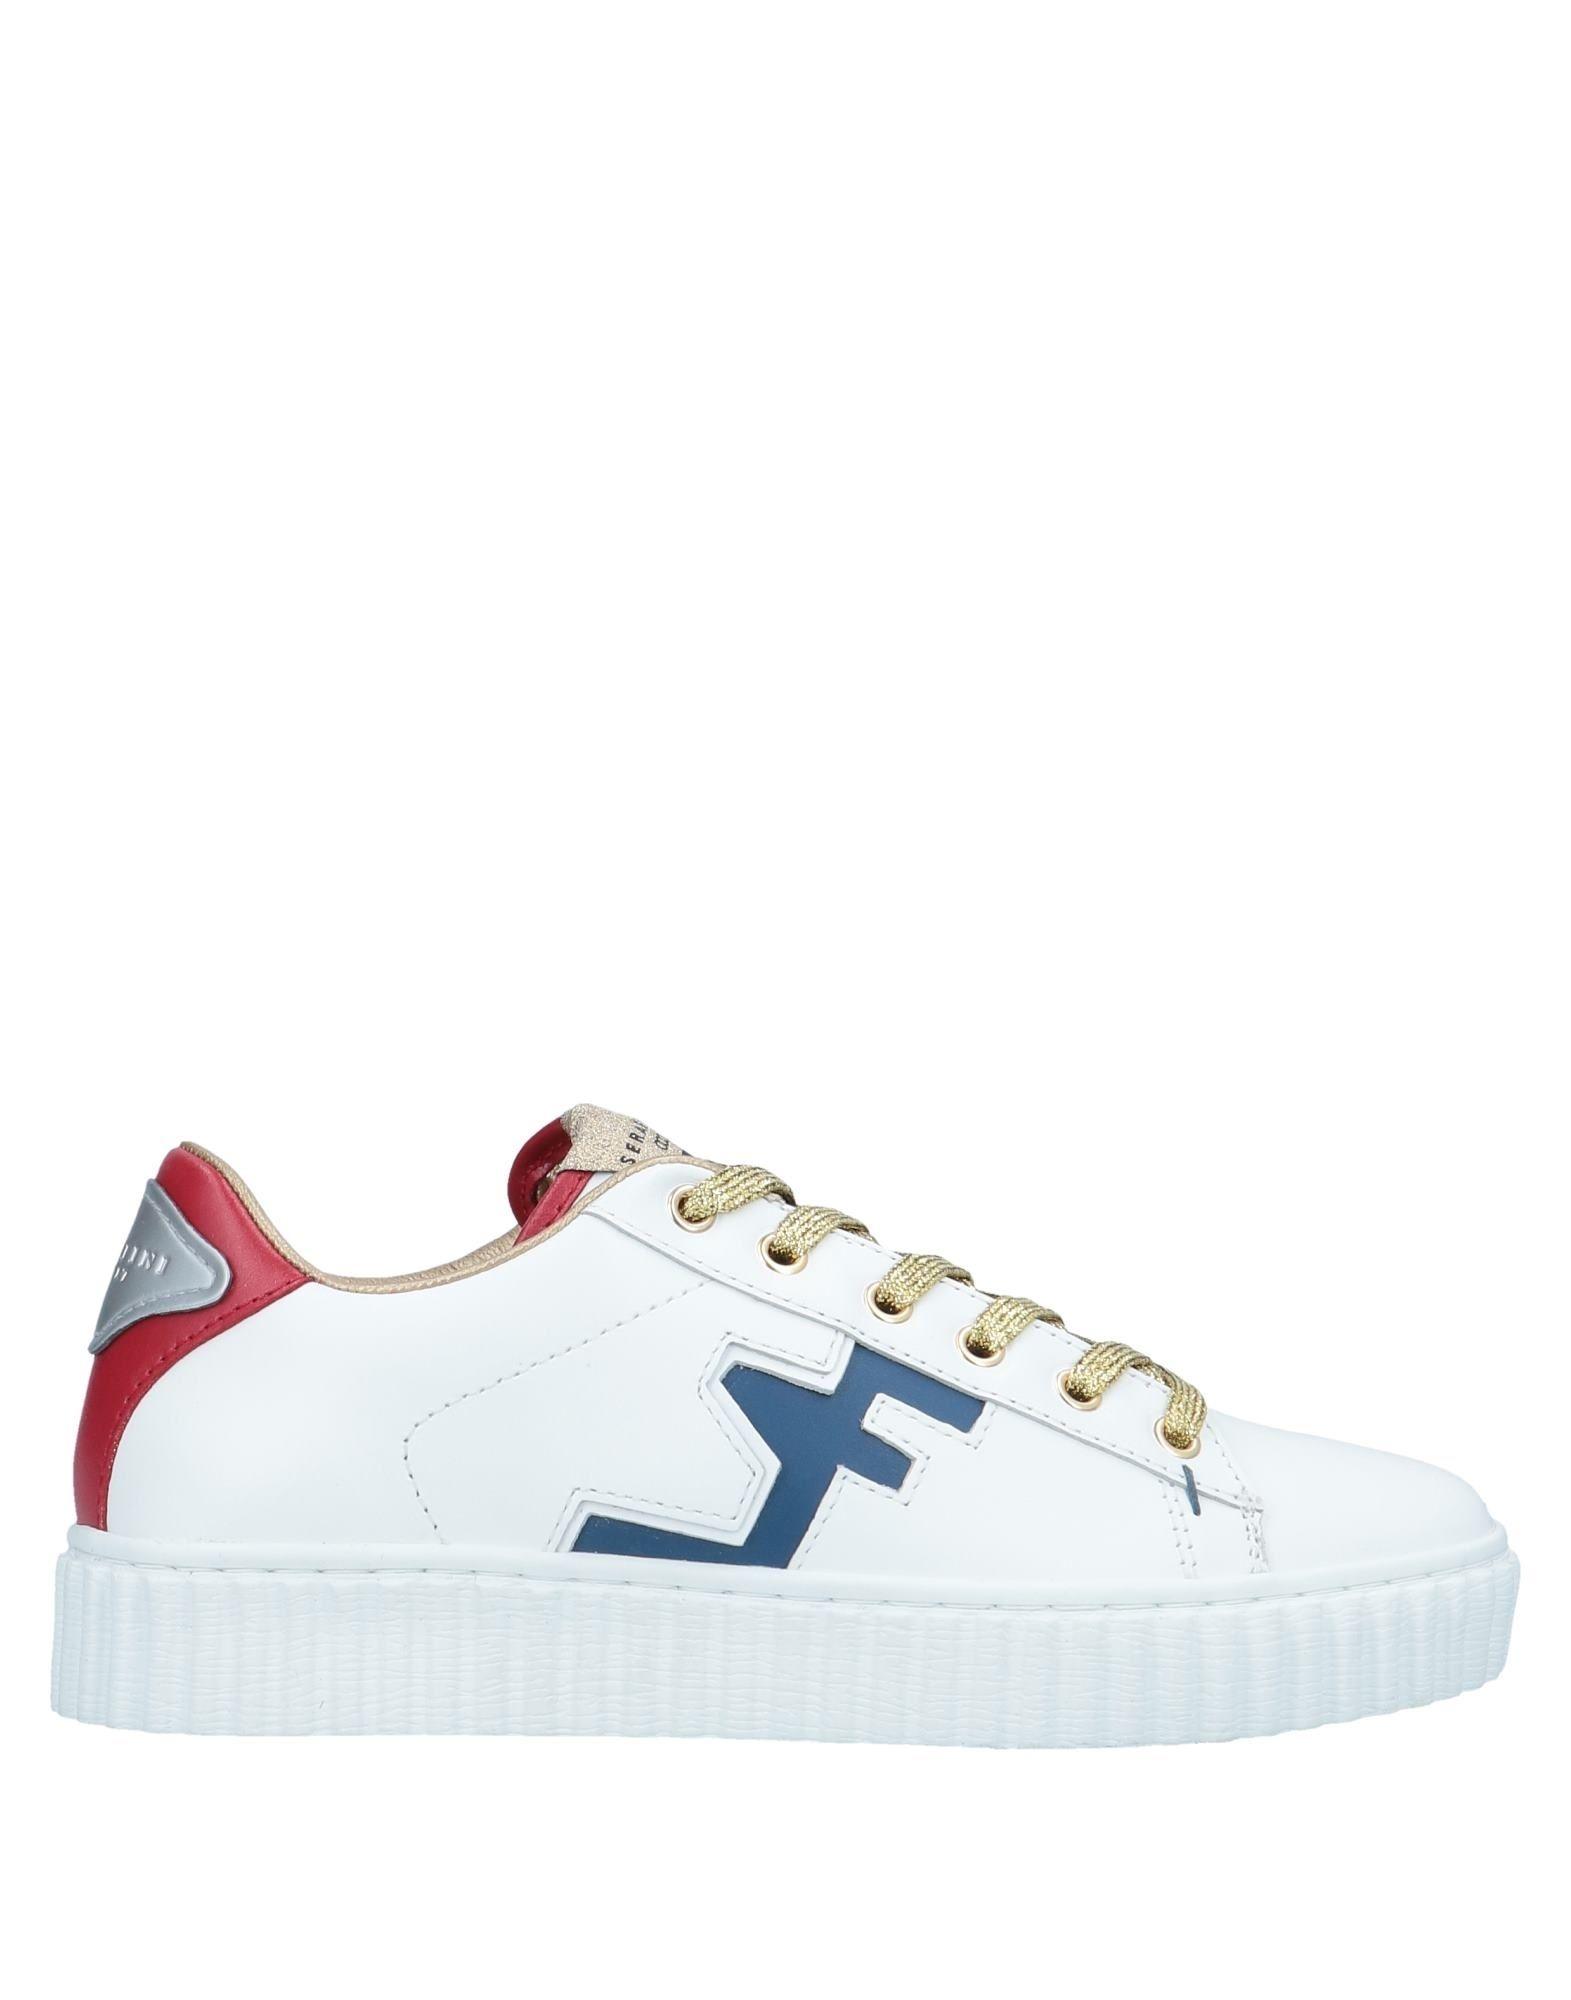 Serafini on Sport Sneakers - Women Serafini Sport Sneakers online on Serafini  Canada - 11568079VP d18794